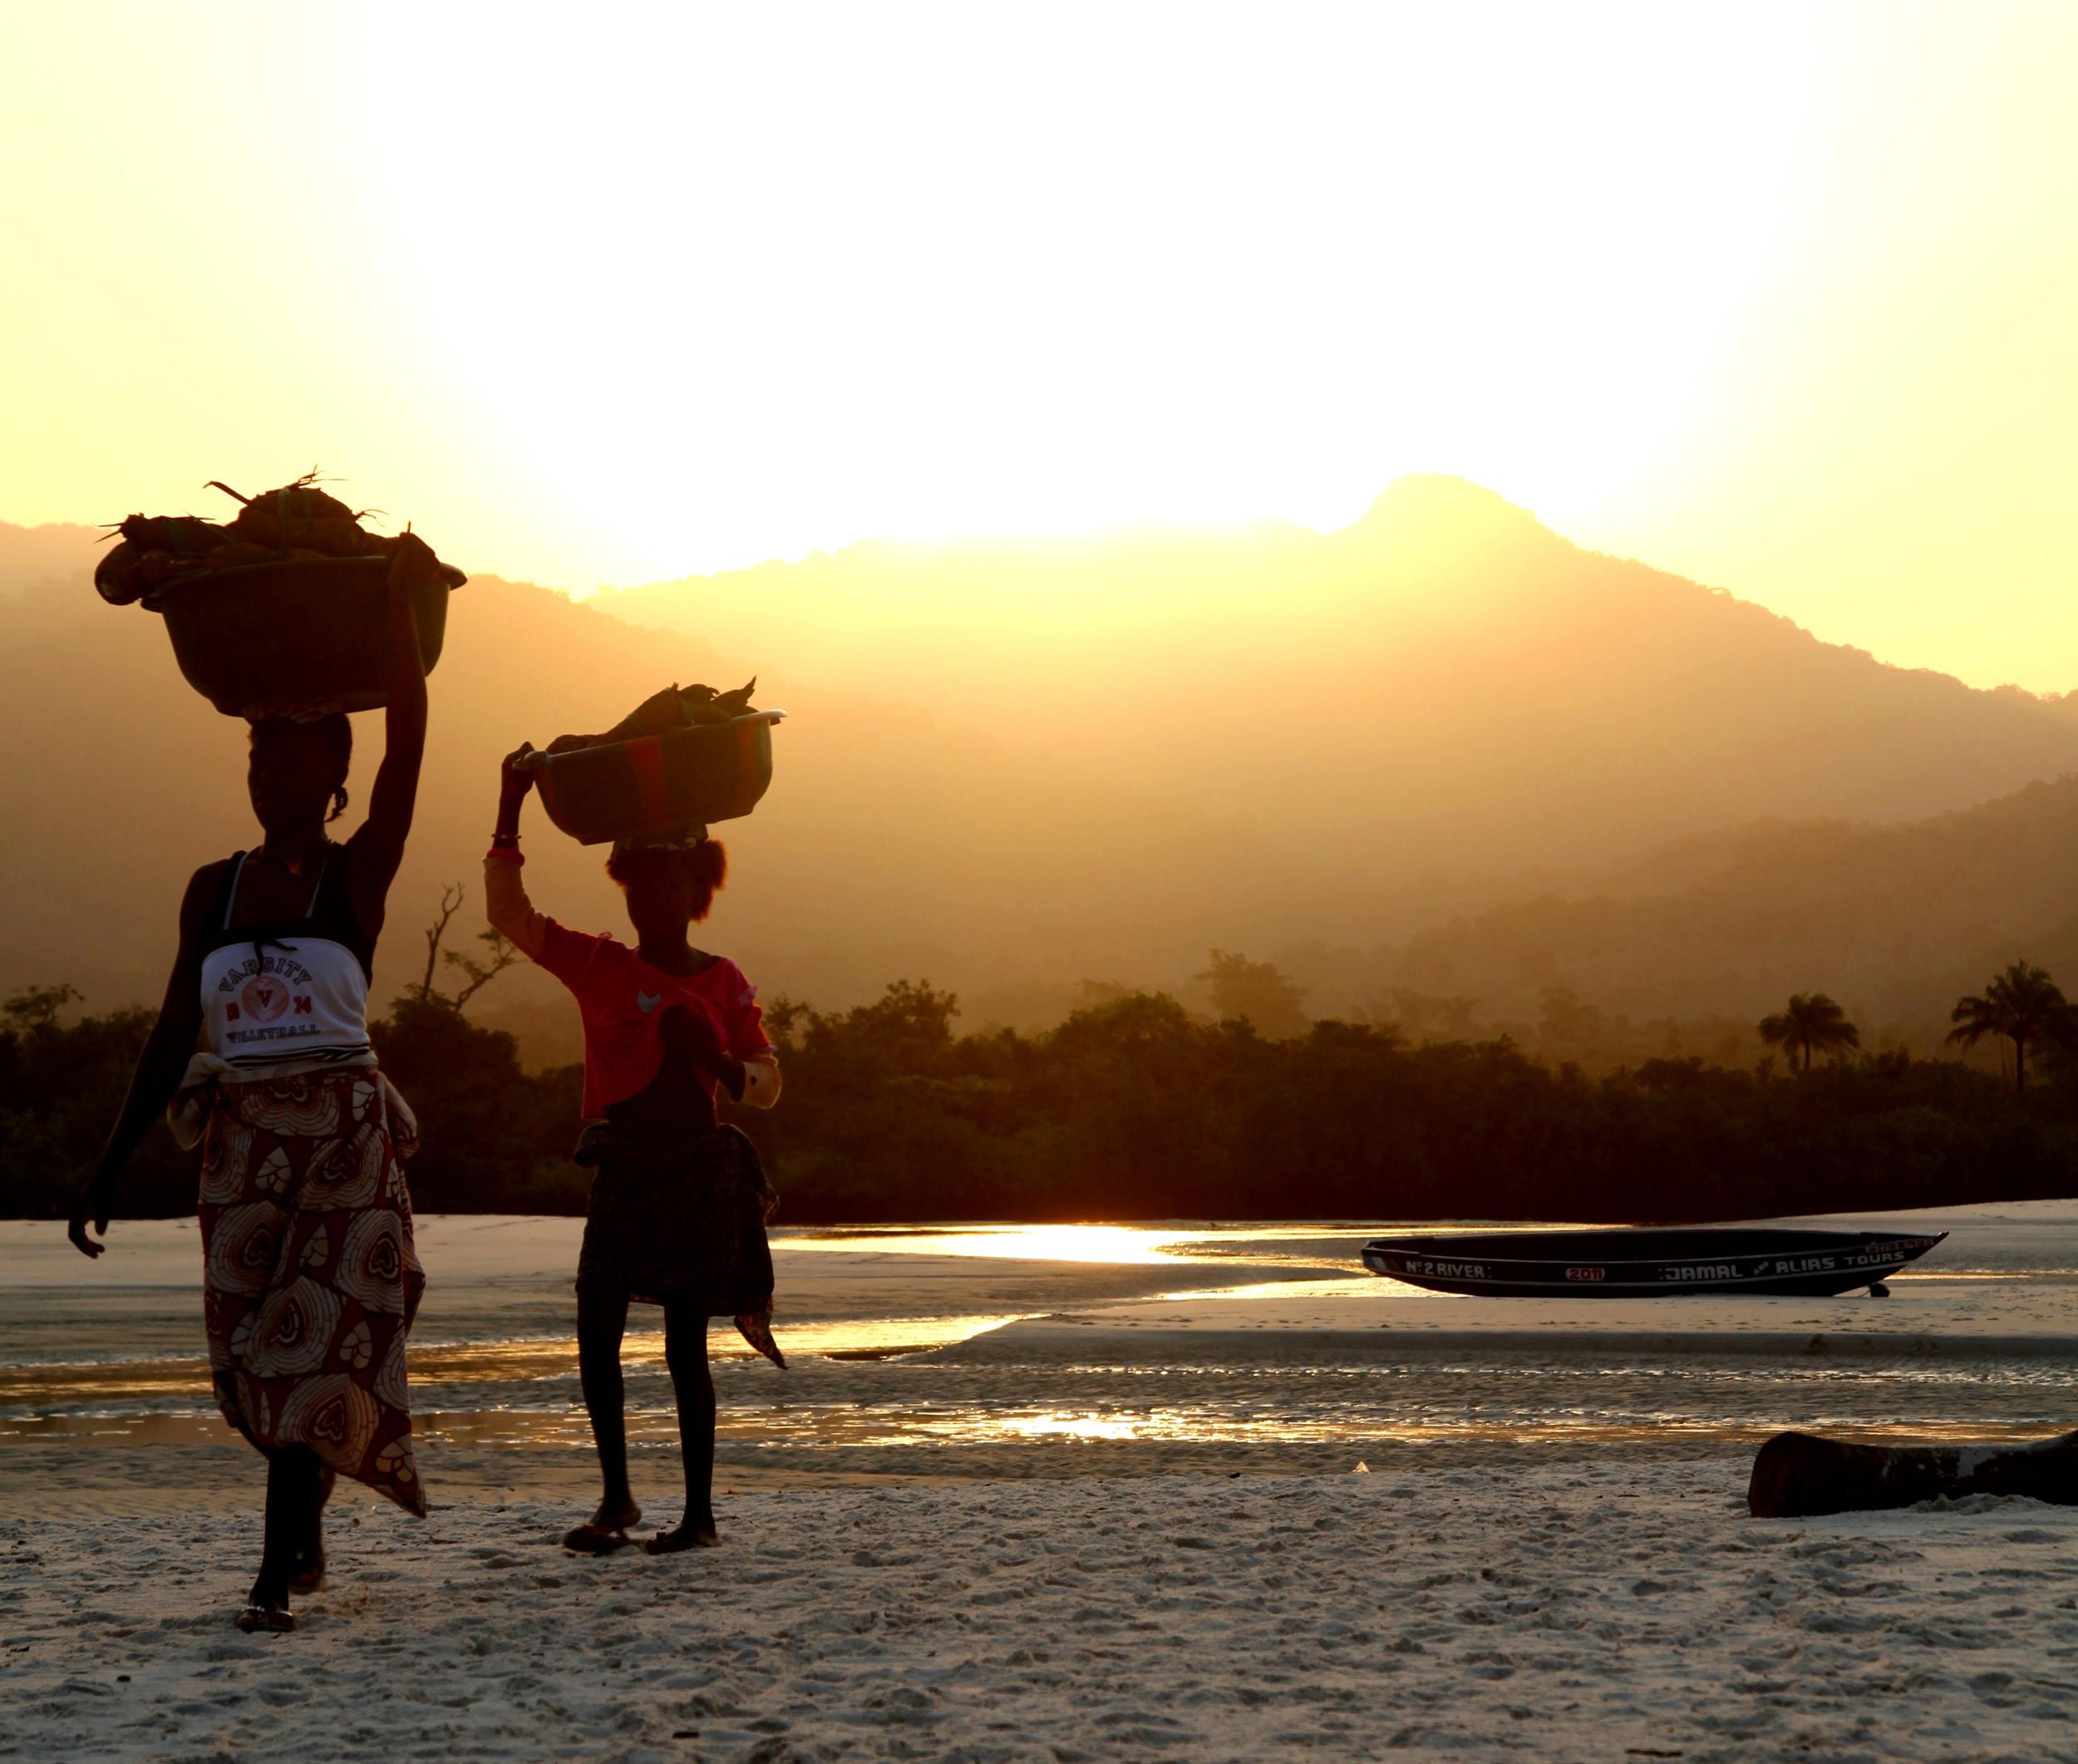 Fostering Education, Public Health & Female Empowerment in Sierra Leone Since 2006